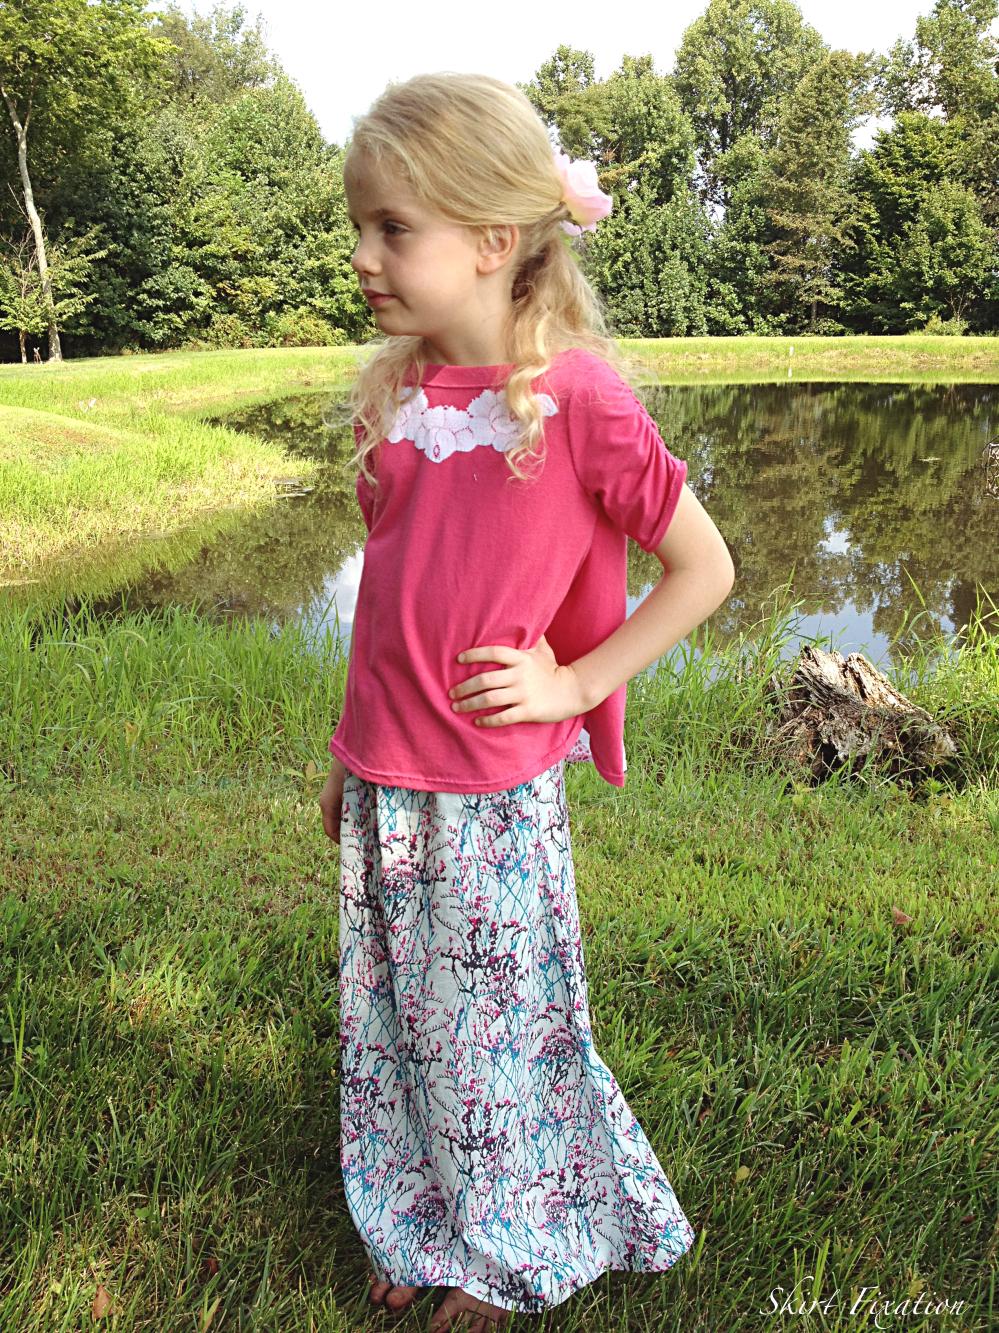 Modern Chloris sewn by Skirt Fixation